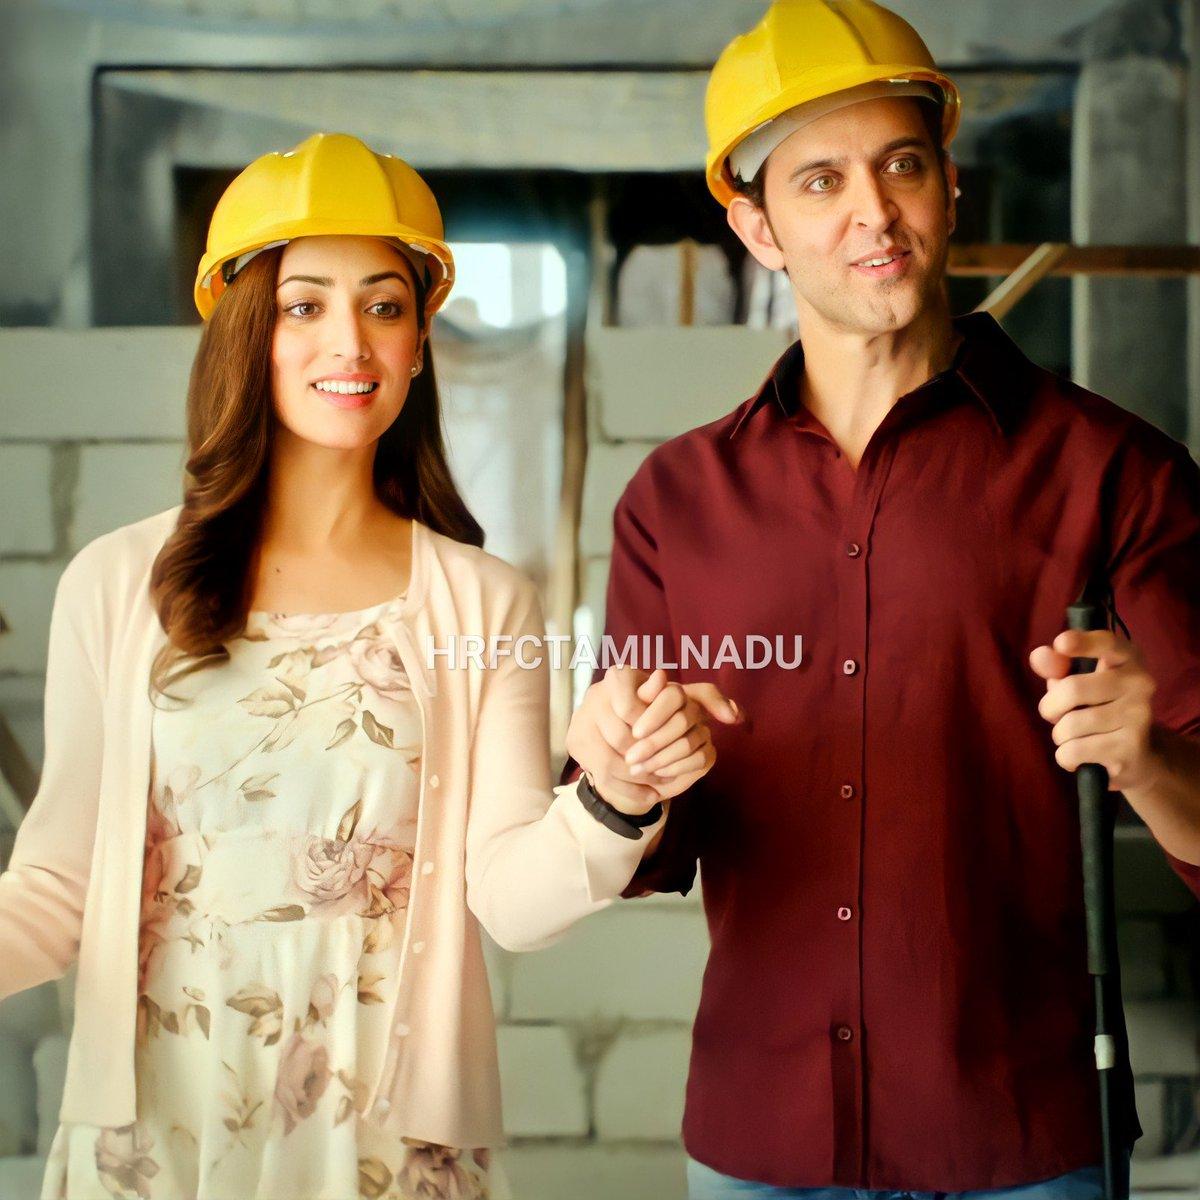 This movie is Love 💖 #kaabil  @iHrithik  @yamigautam   #HrithikRoshan | #Hrfctamilnadu | #YamiGautam